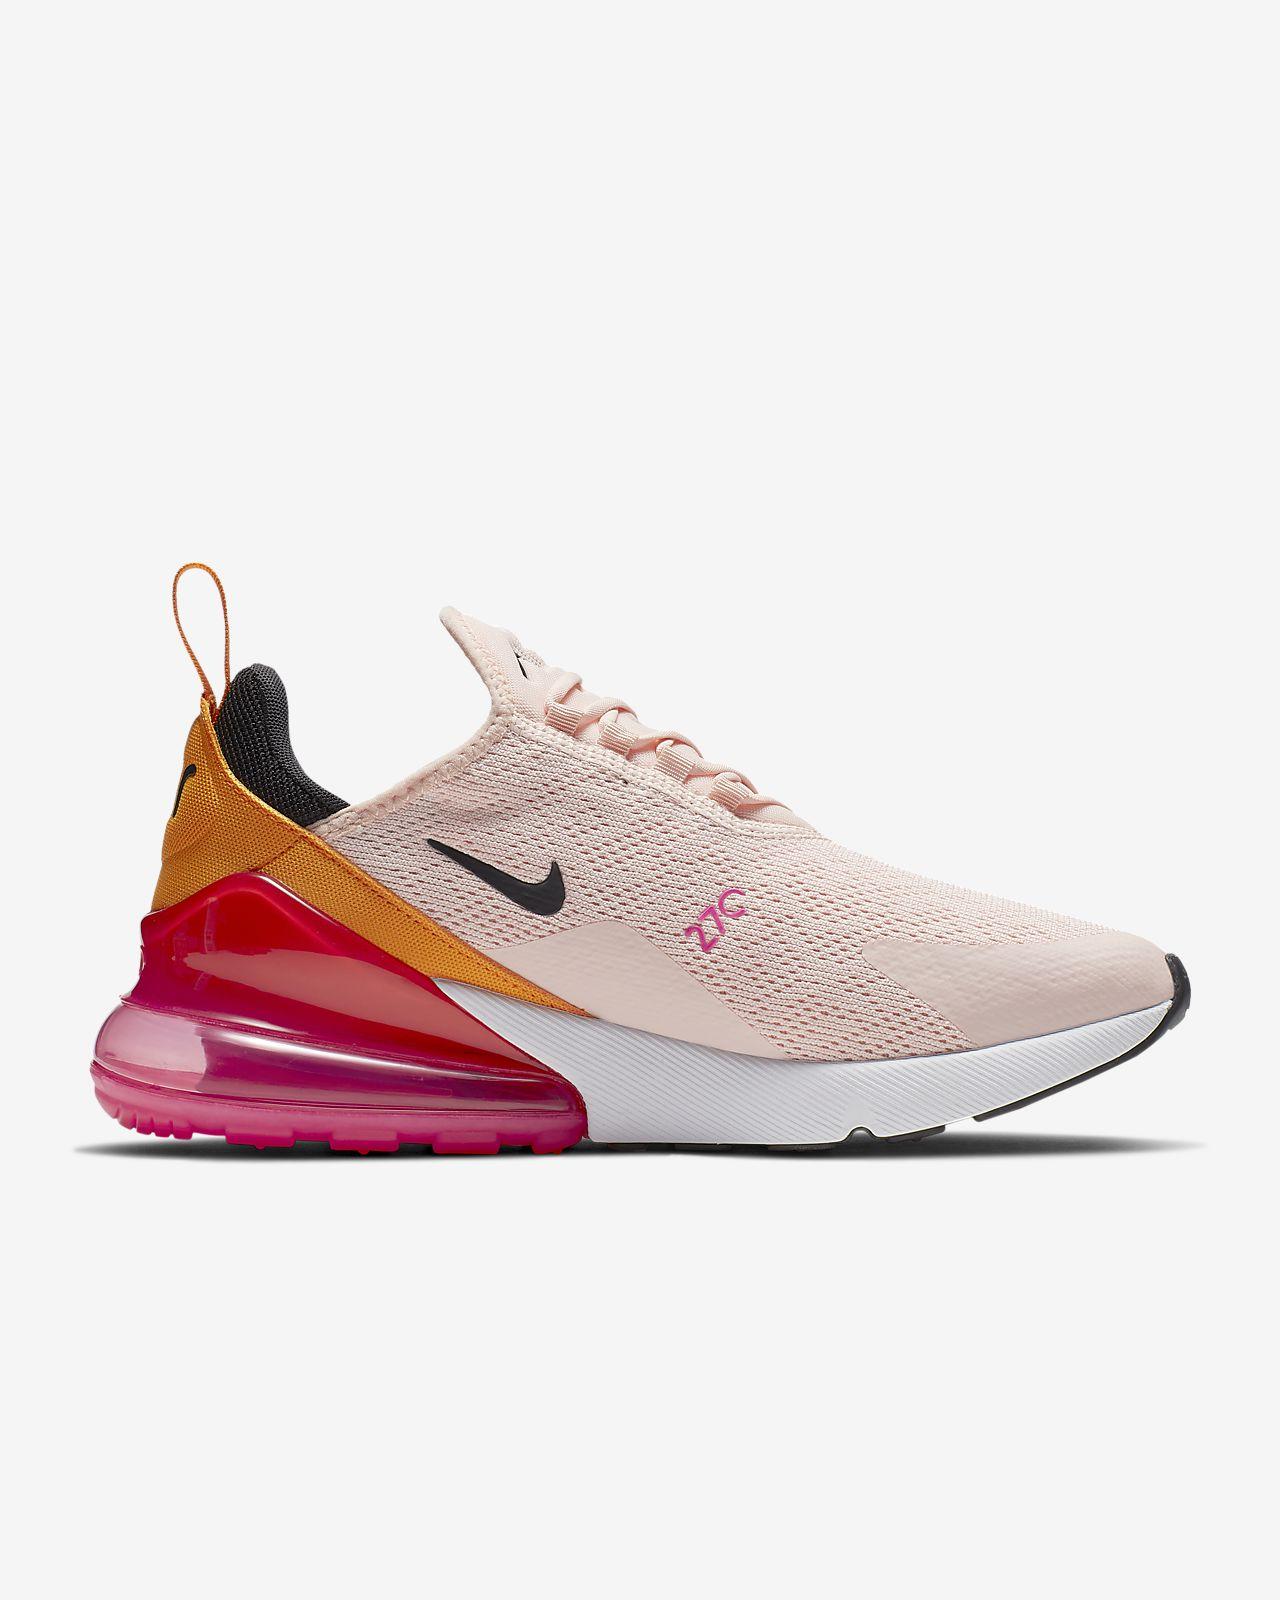 innovative design fa18d d86d7 ... Chaussure Nike Air Max 270 pour Femme